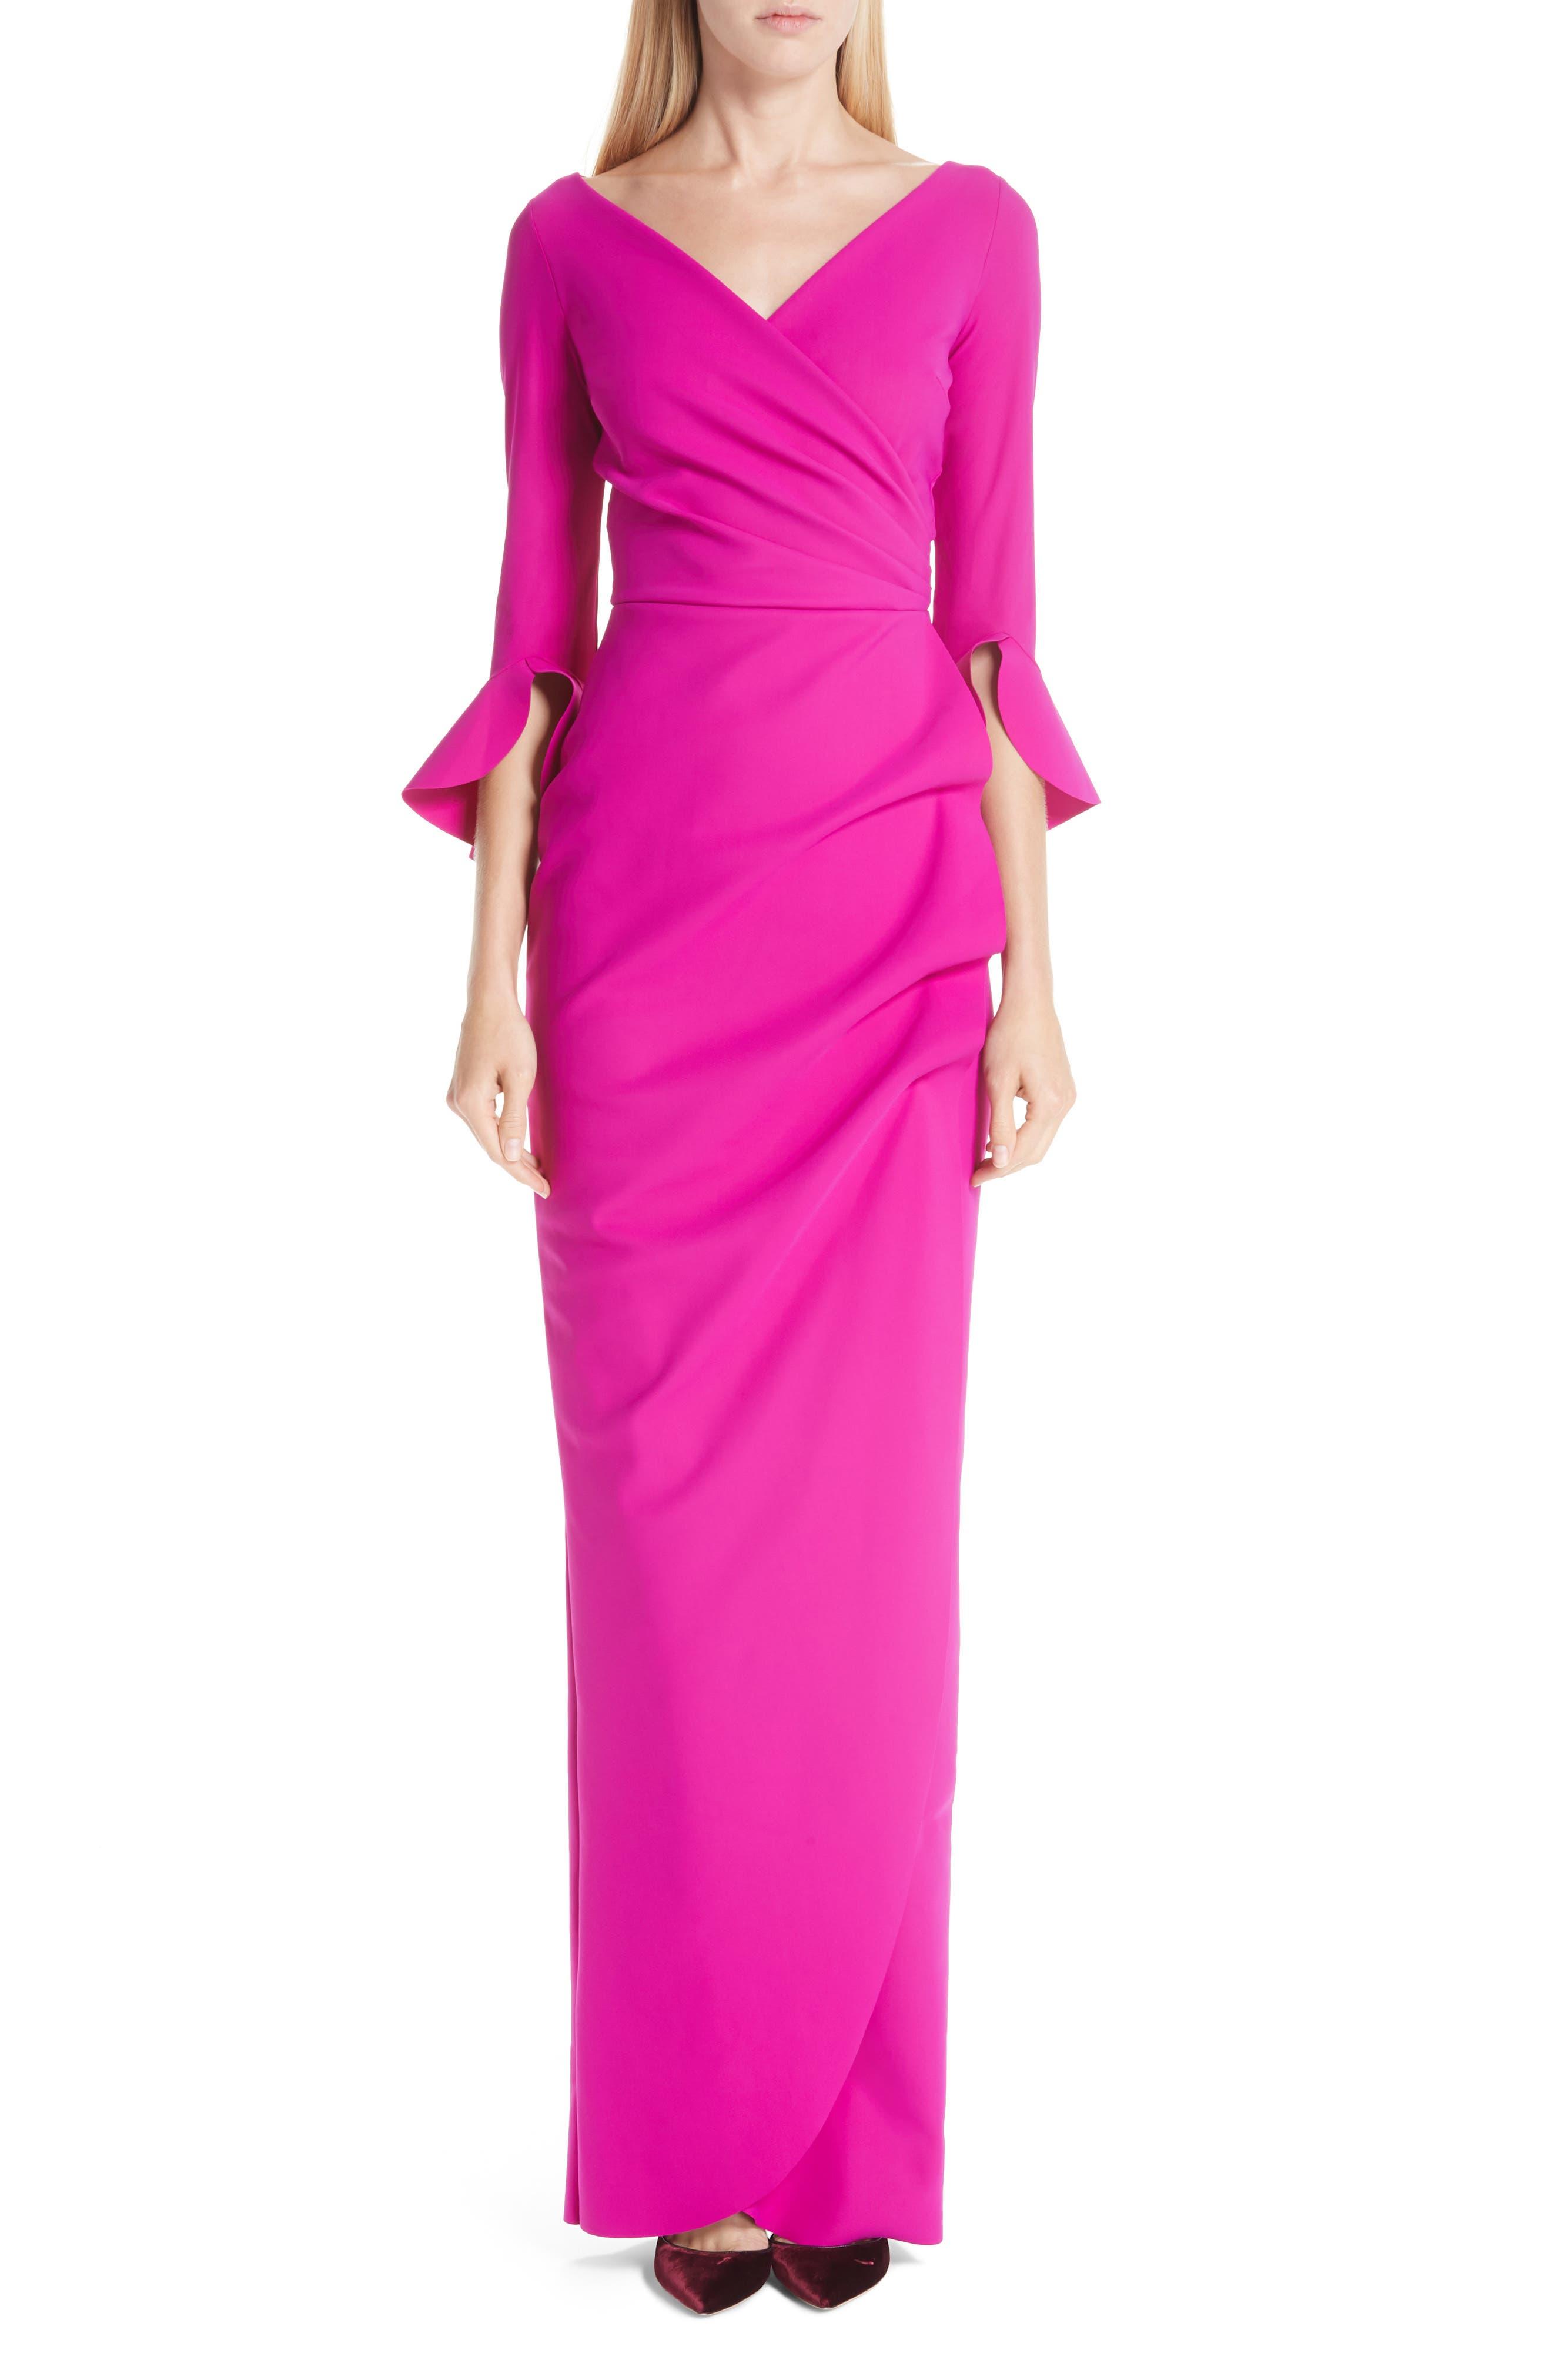 Chiara Boni La Petite Robe Ruched Bell Sleeve Evening Dress, 8 IT - Pink